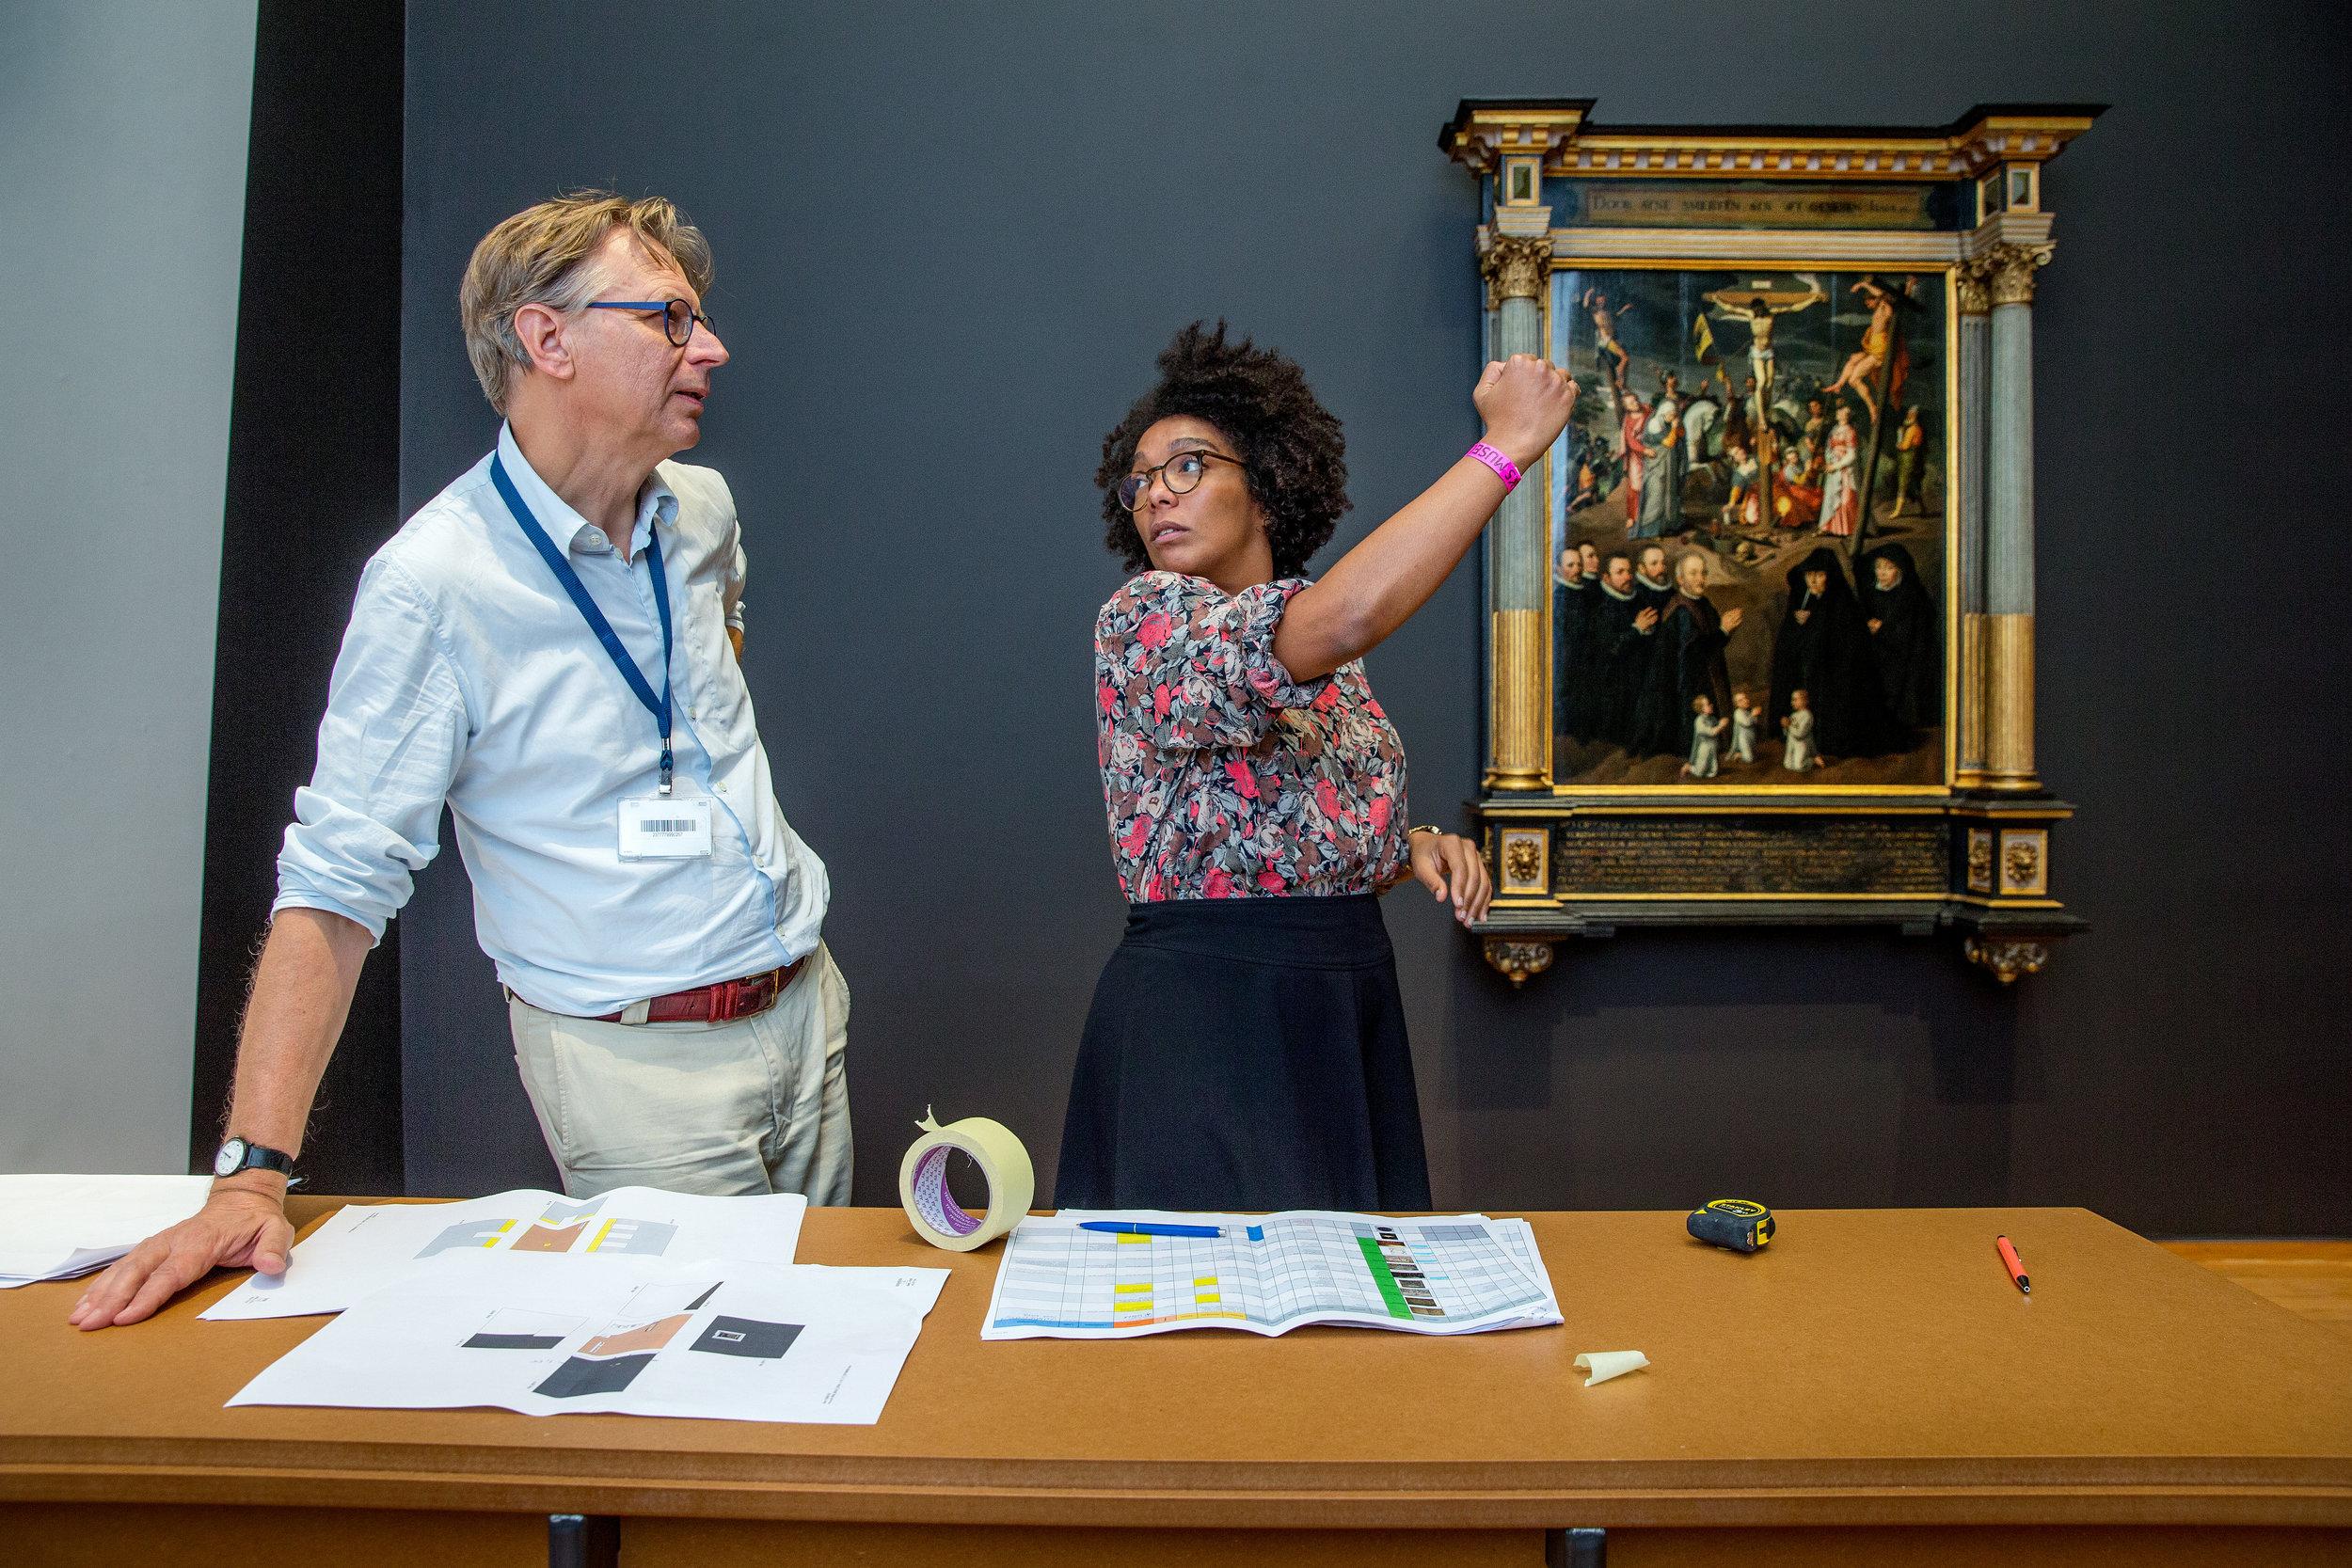 JPJ Rijksmuseum27.jpg